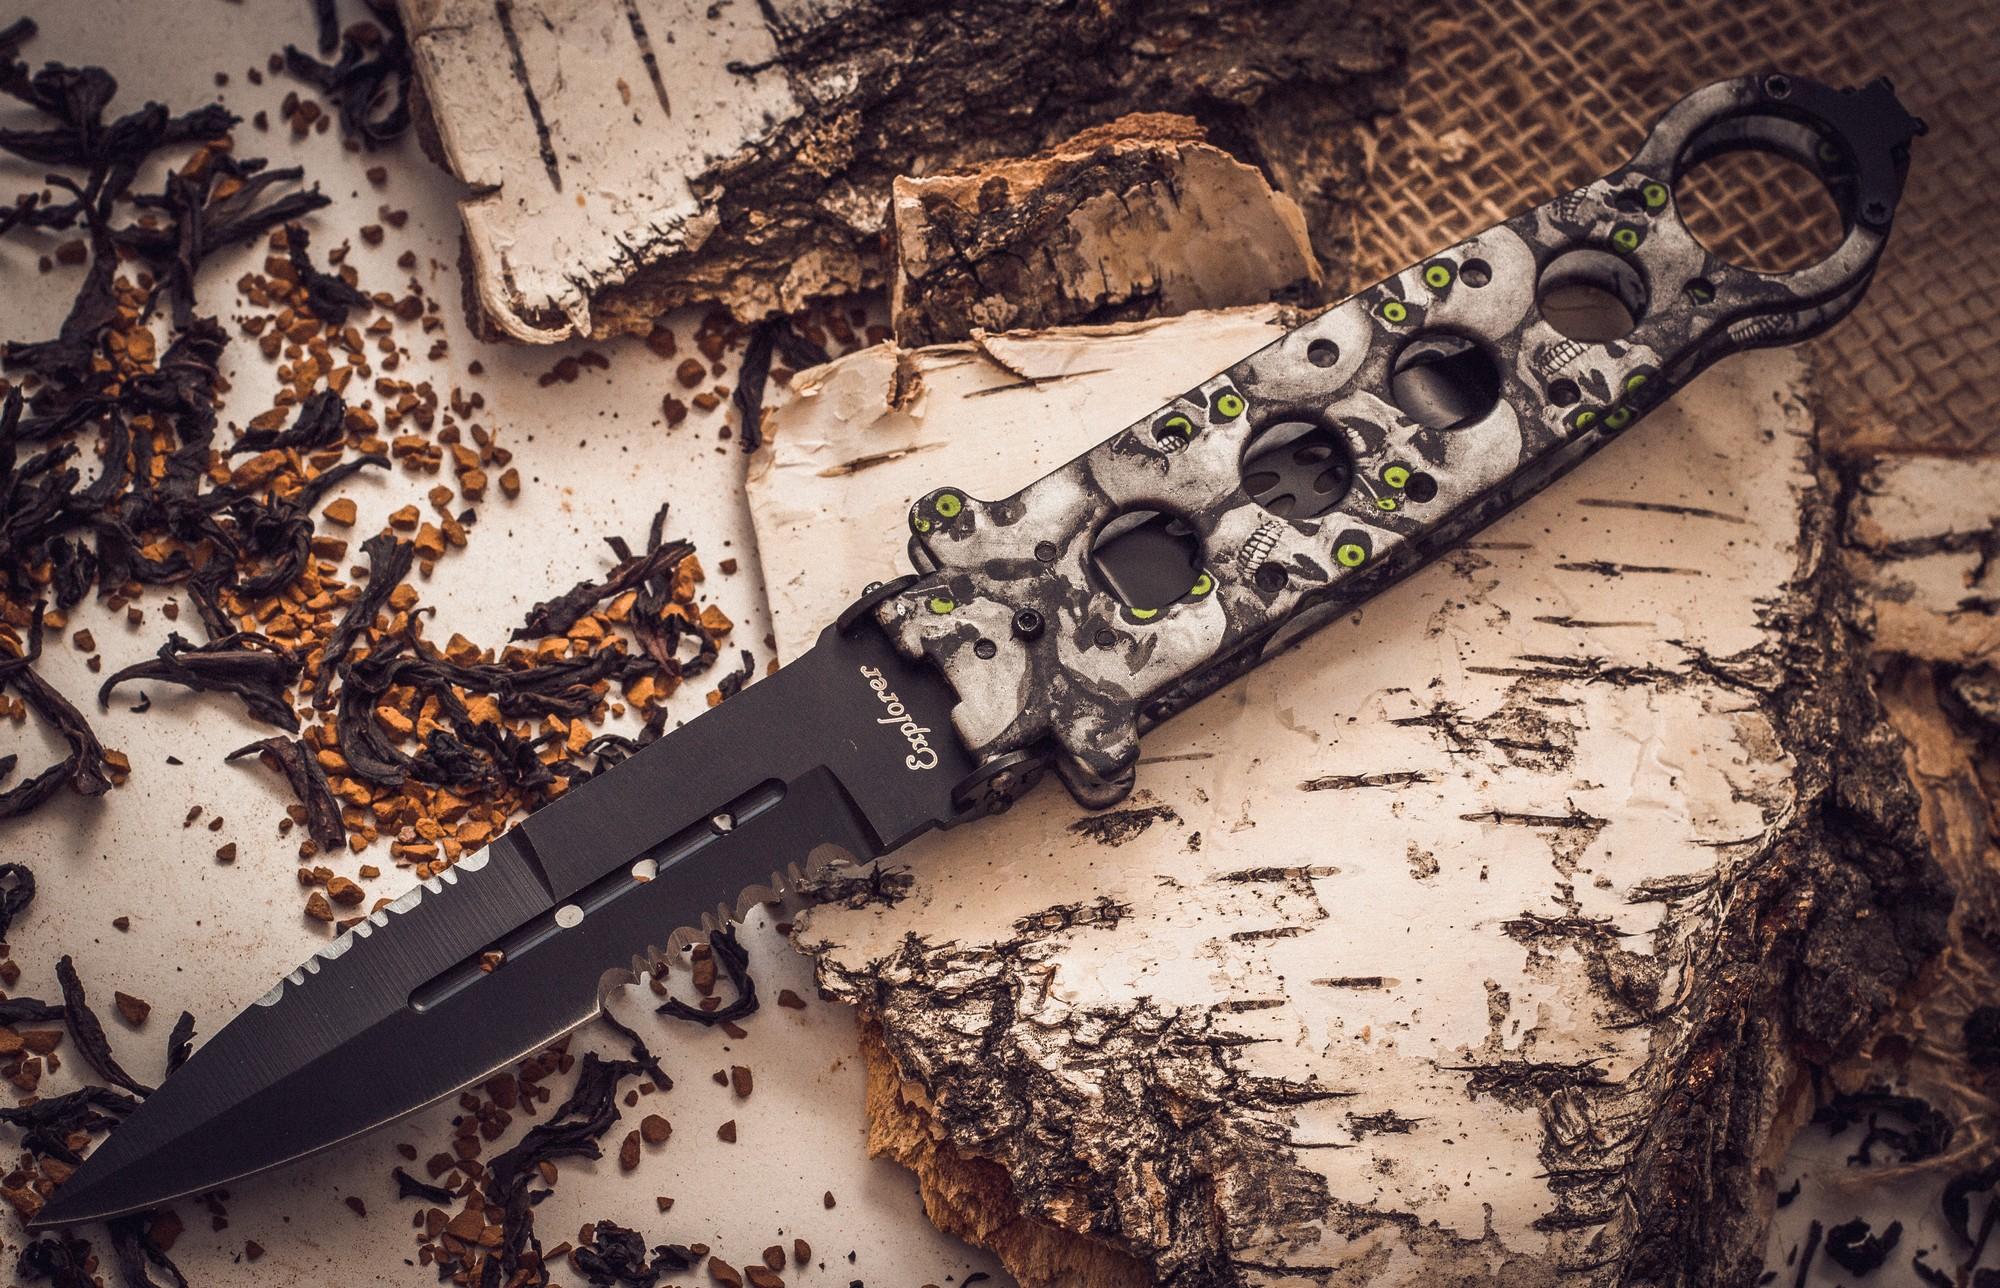 Нож-рамка Хамелеон, рукоять с черепамиРаскладные ножи<br>Нож Хамелеон, рукоять с черепами<br>